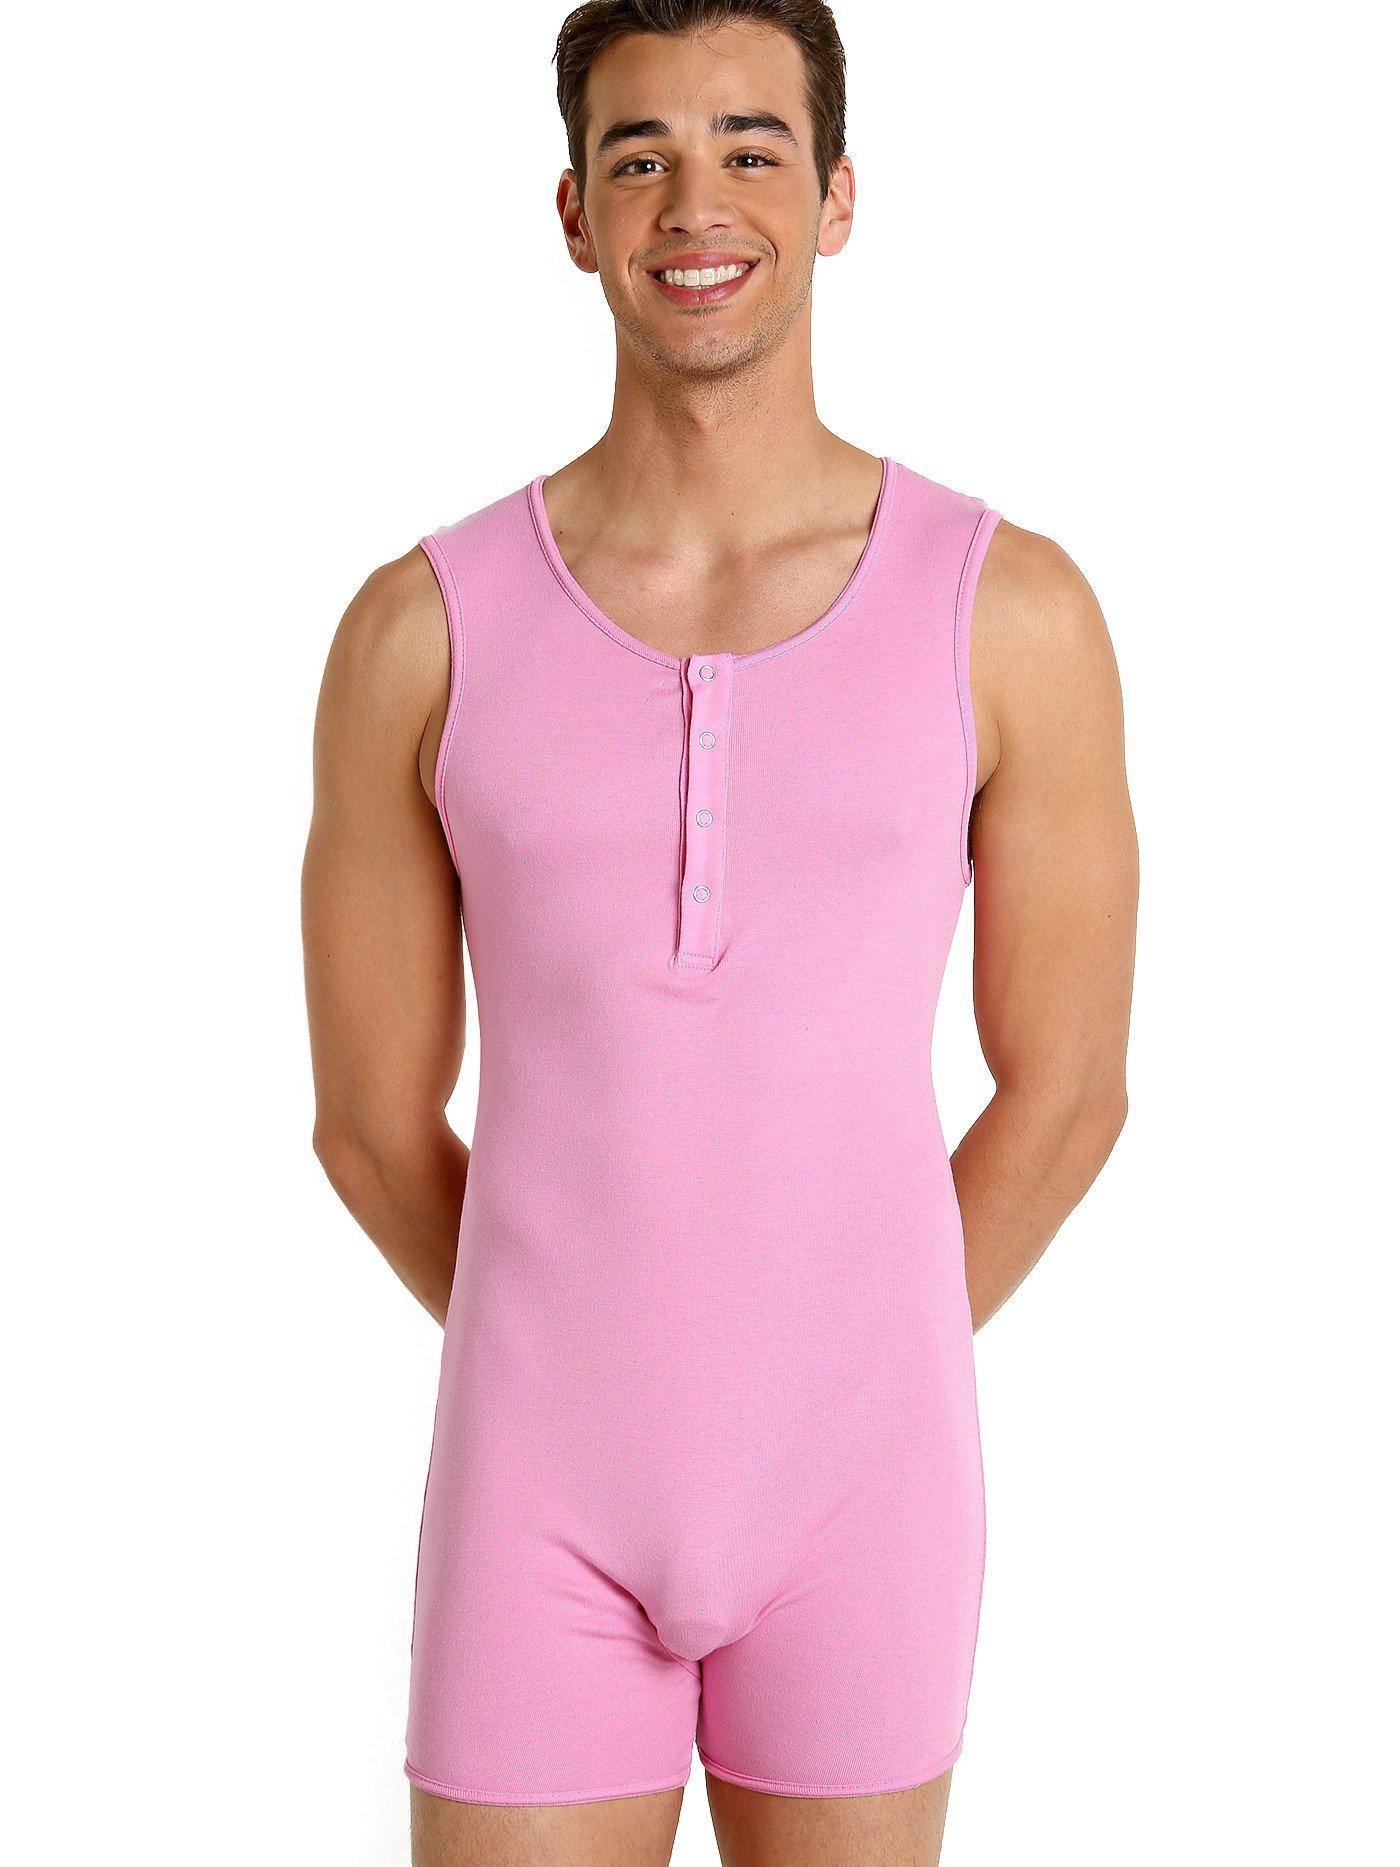 Go Softwear California Guy Onesie Deep Pink